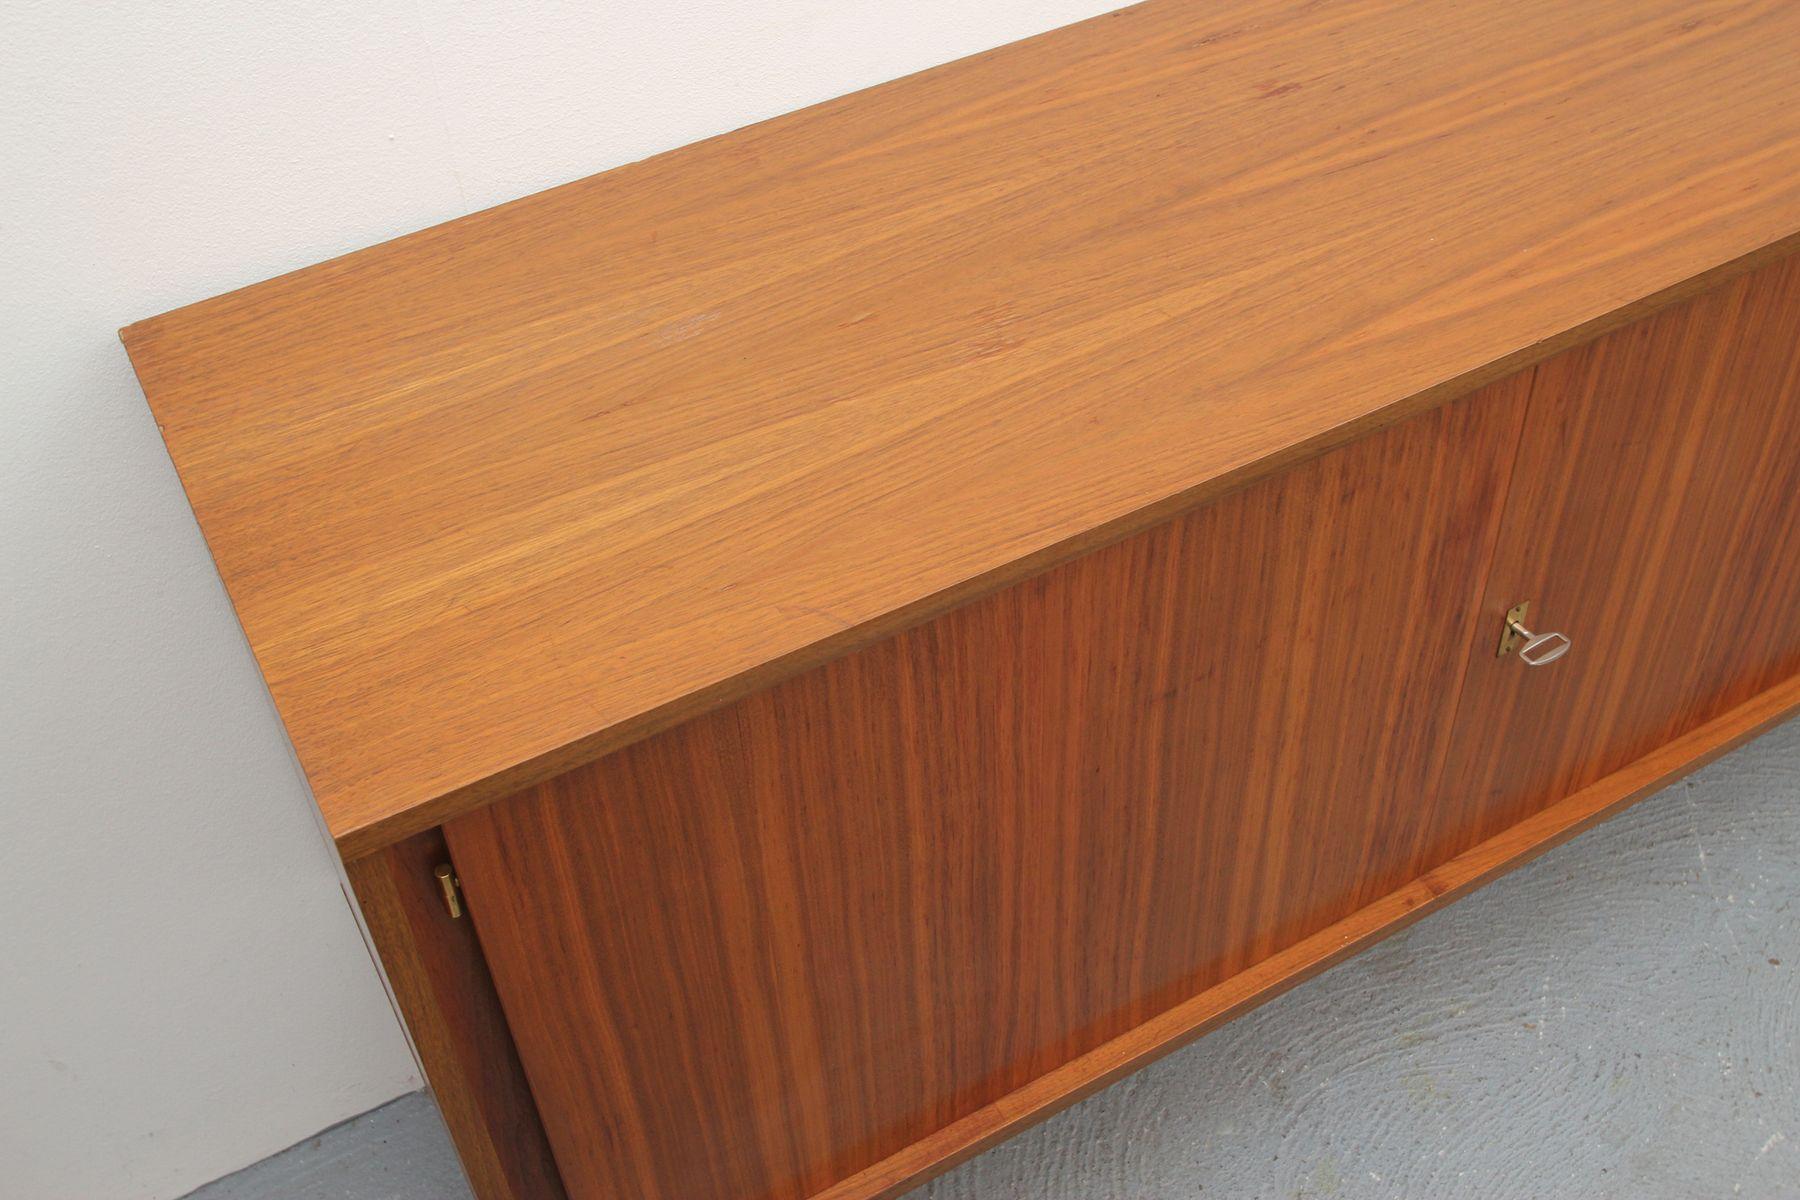 langes sideboard mit nussholz furnier bei pamono kaufen. Black Bedroom Furniture Sets. Home Design Ideas